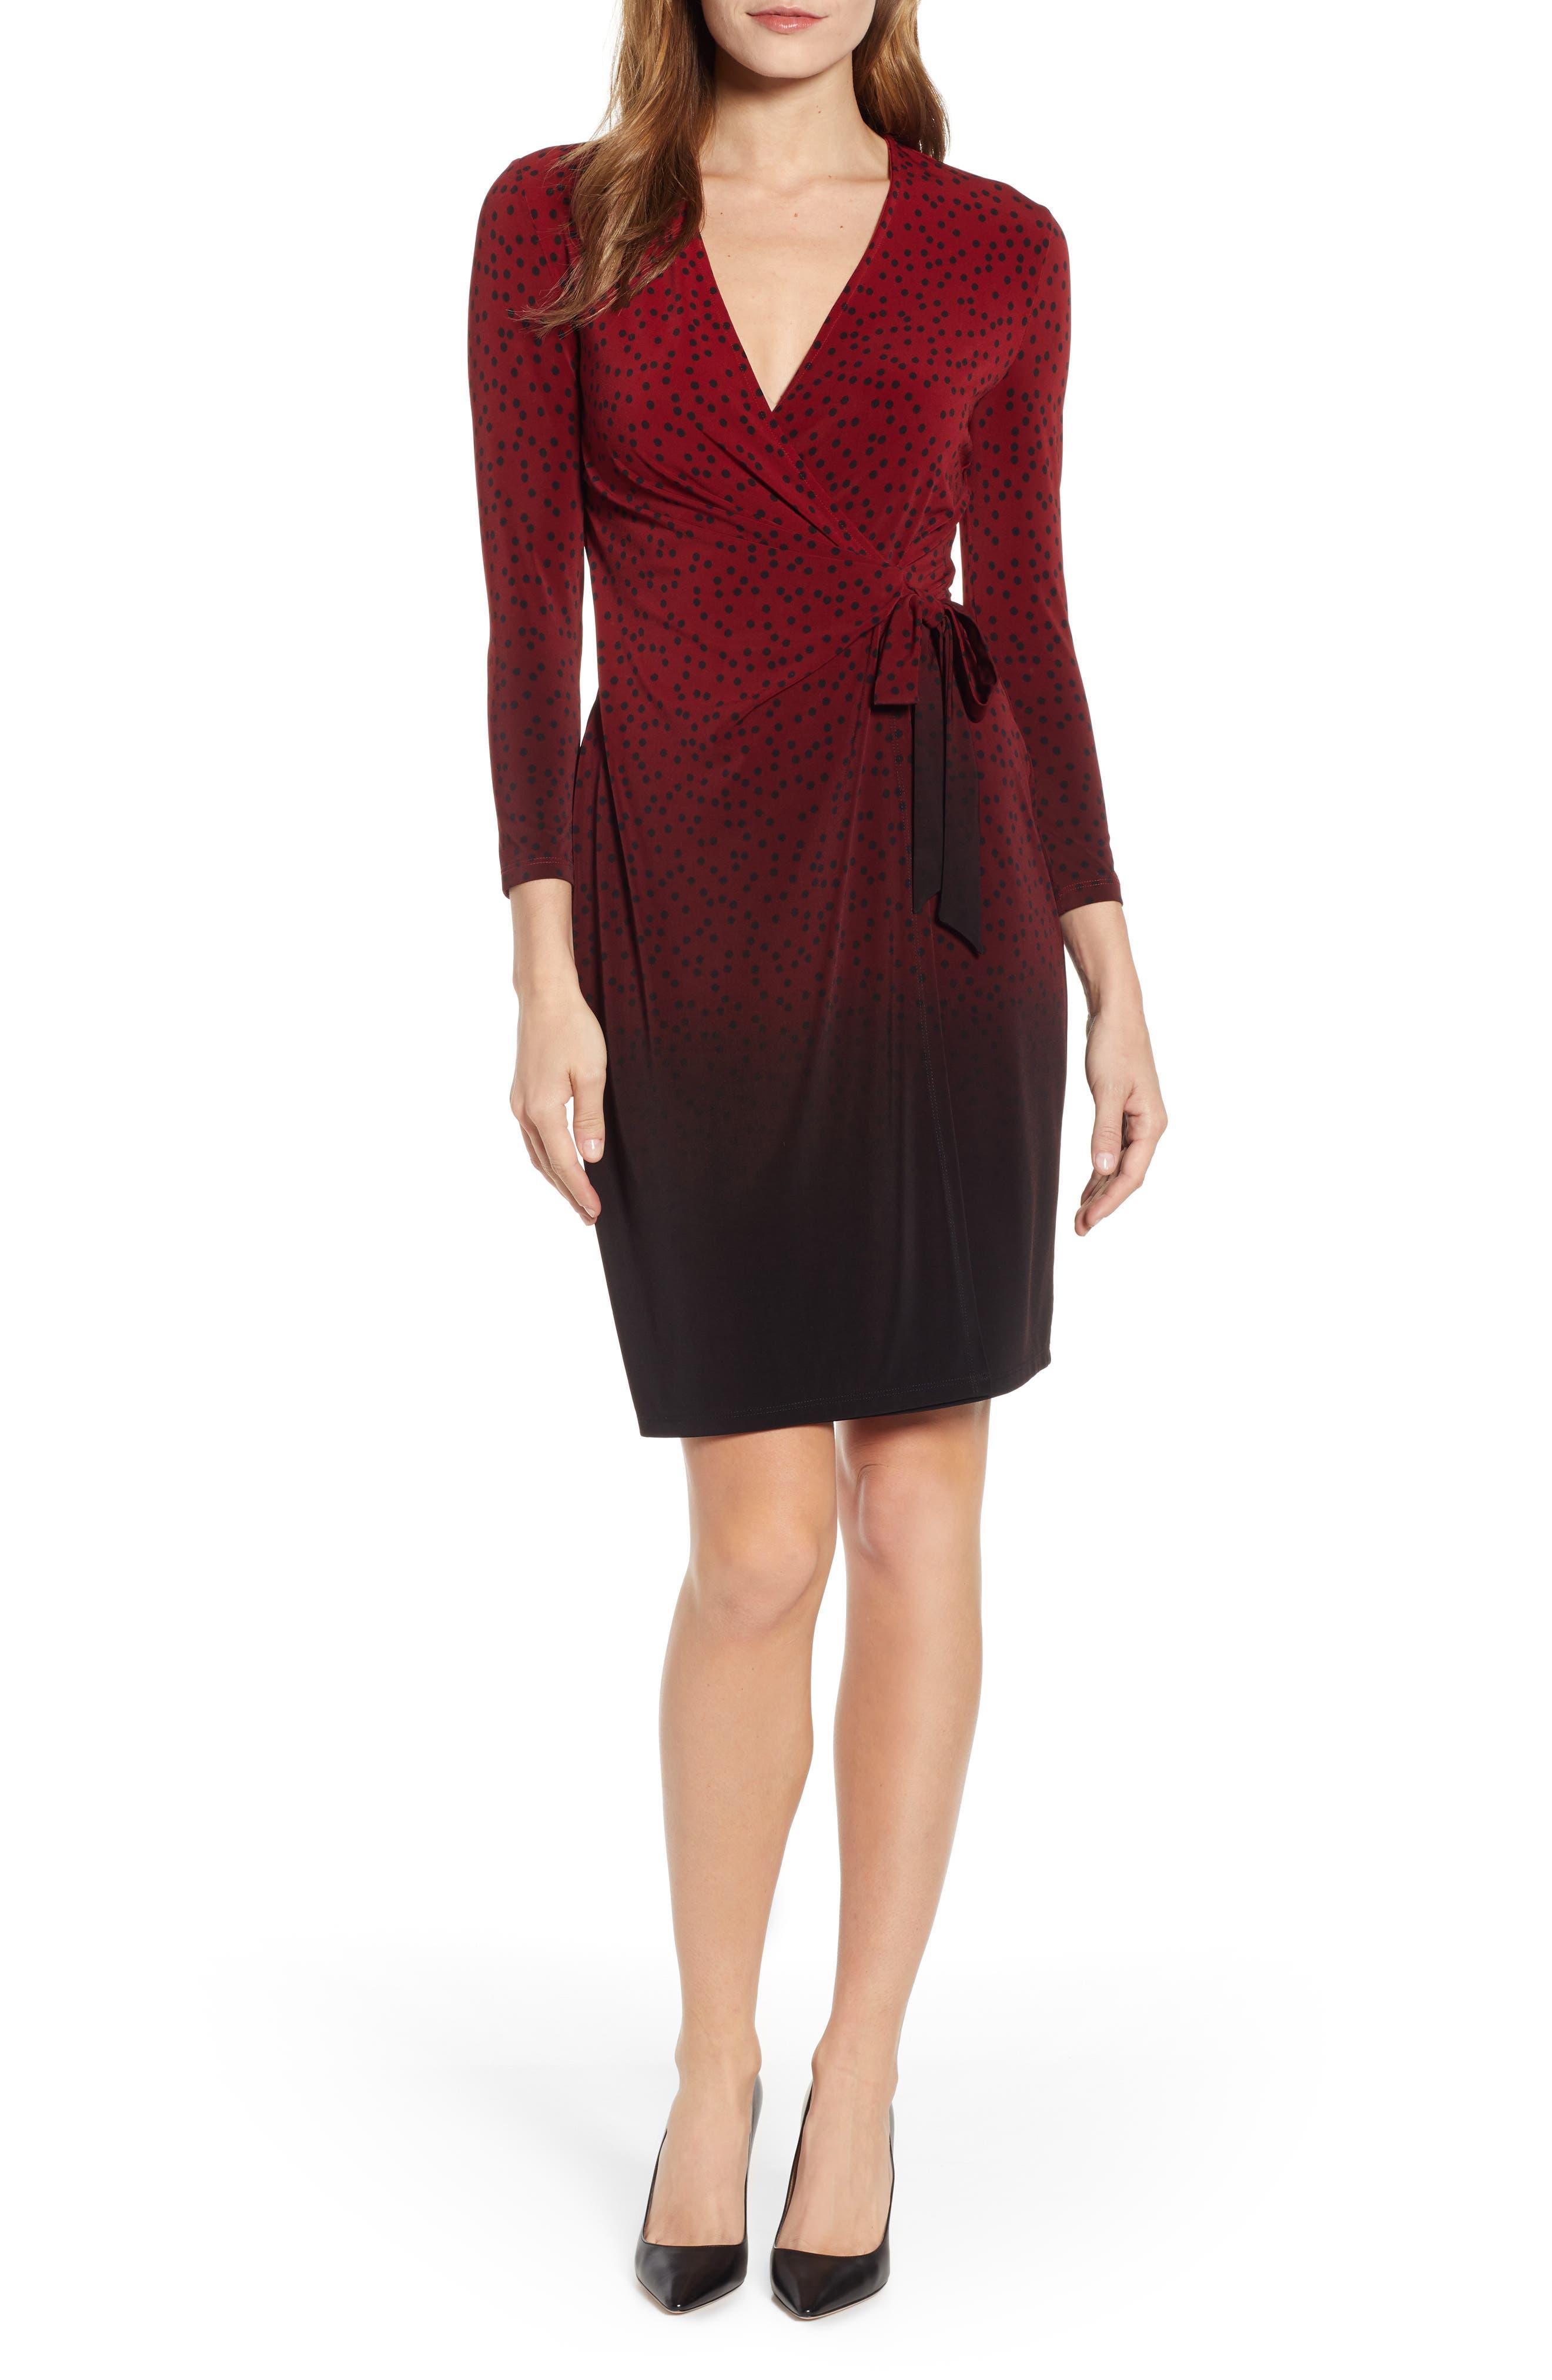 ANNE KLEIN Camille Dot Faux Wrap Dress, Main, color, DK TITIAN RED/ ANNE BLK COMBO